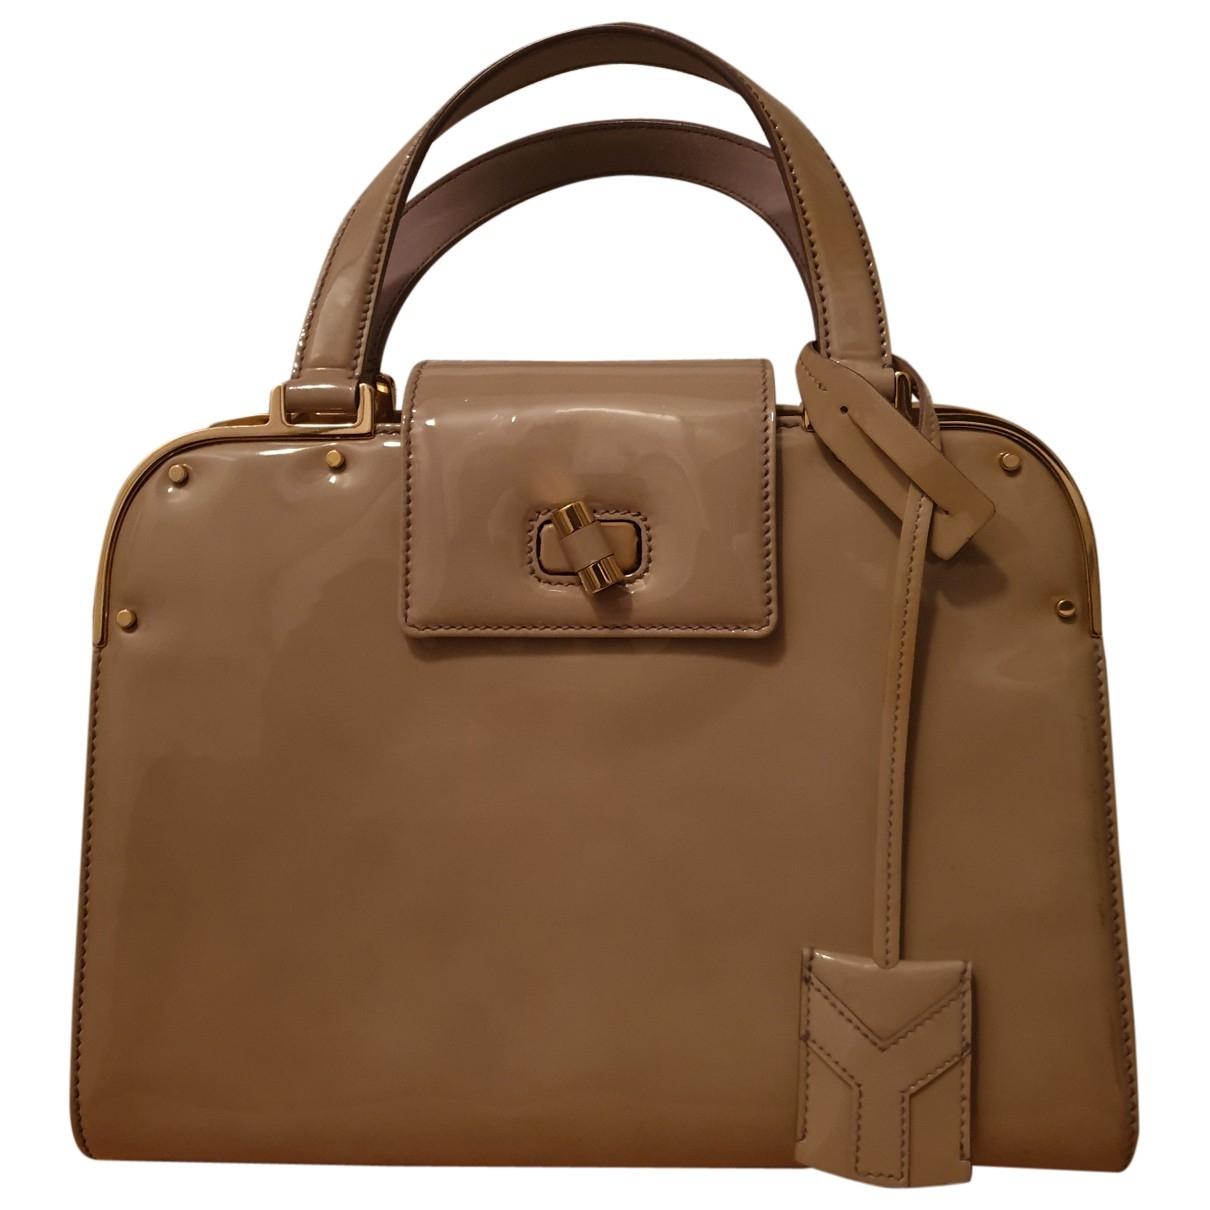 Yves Saint Laurent \N Handtasche in  Ecru Lackleder